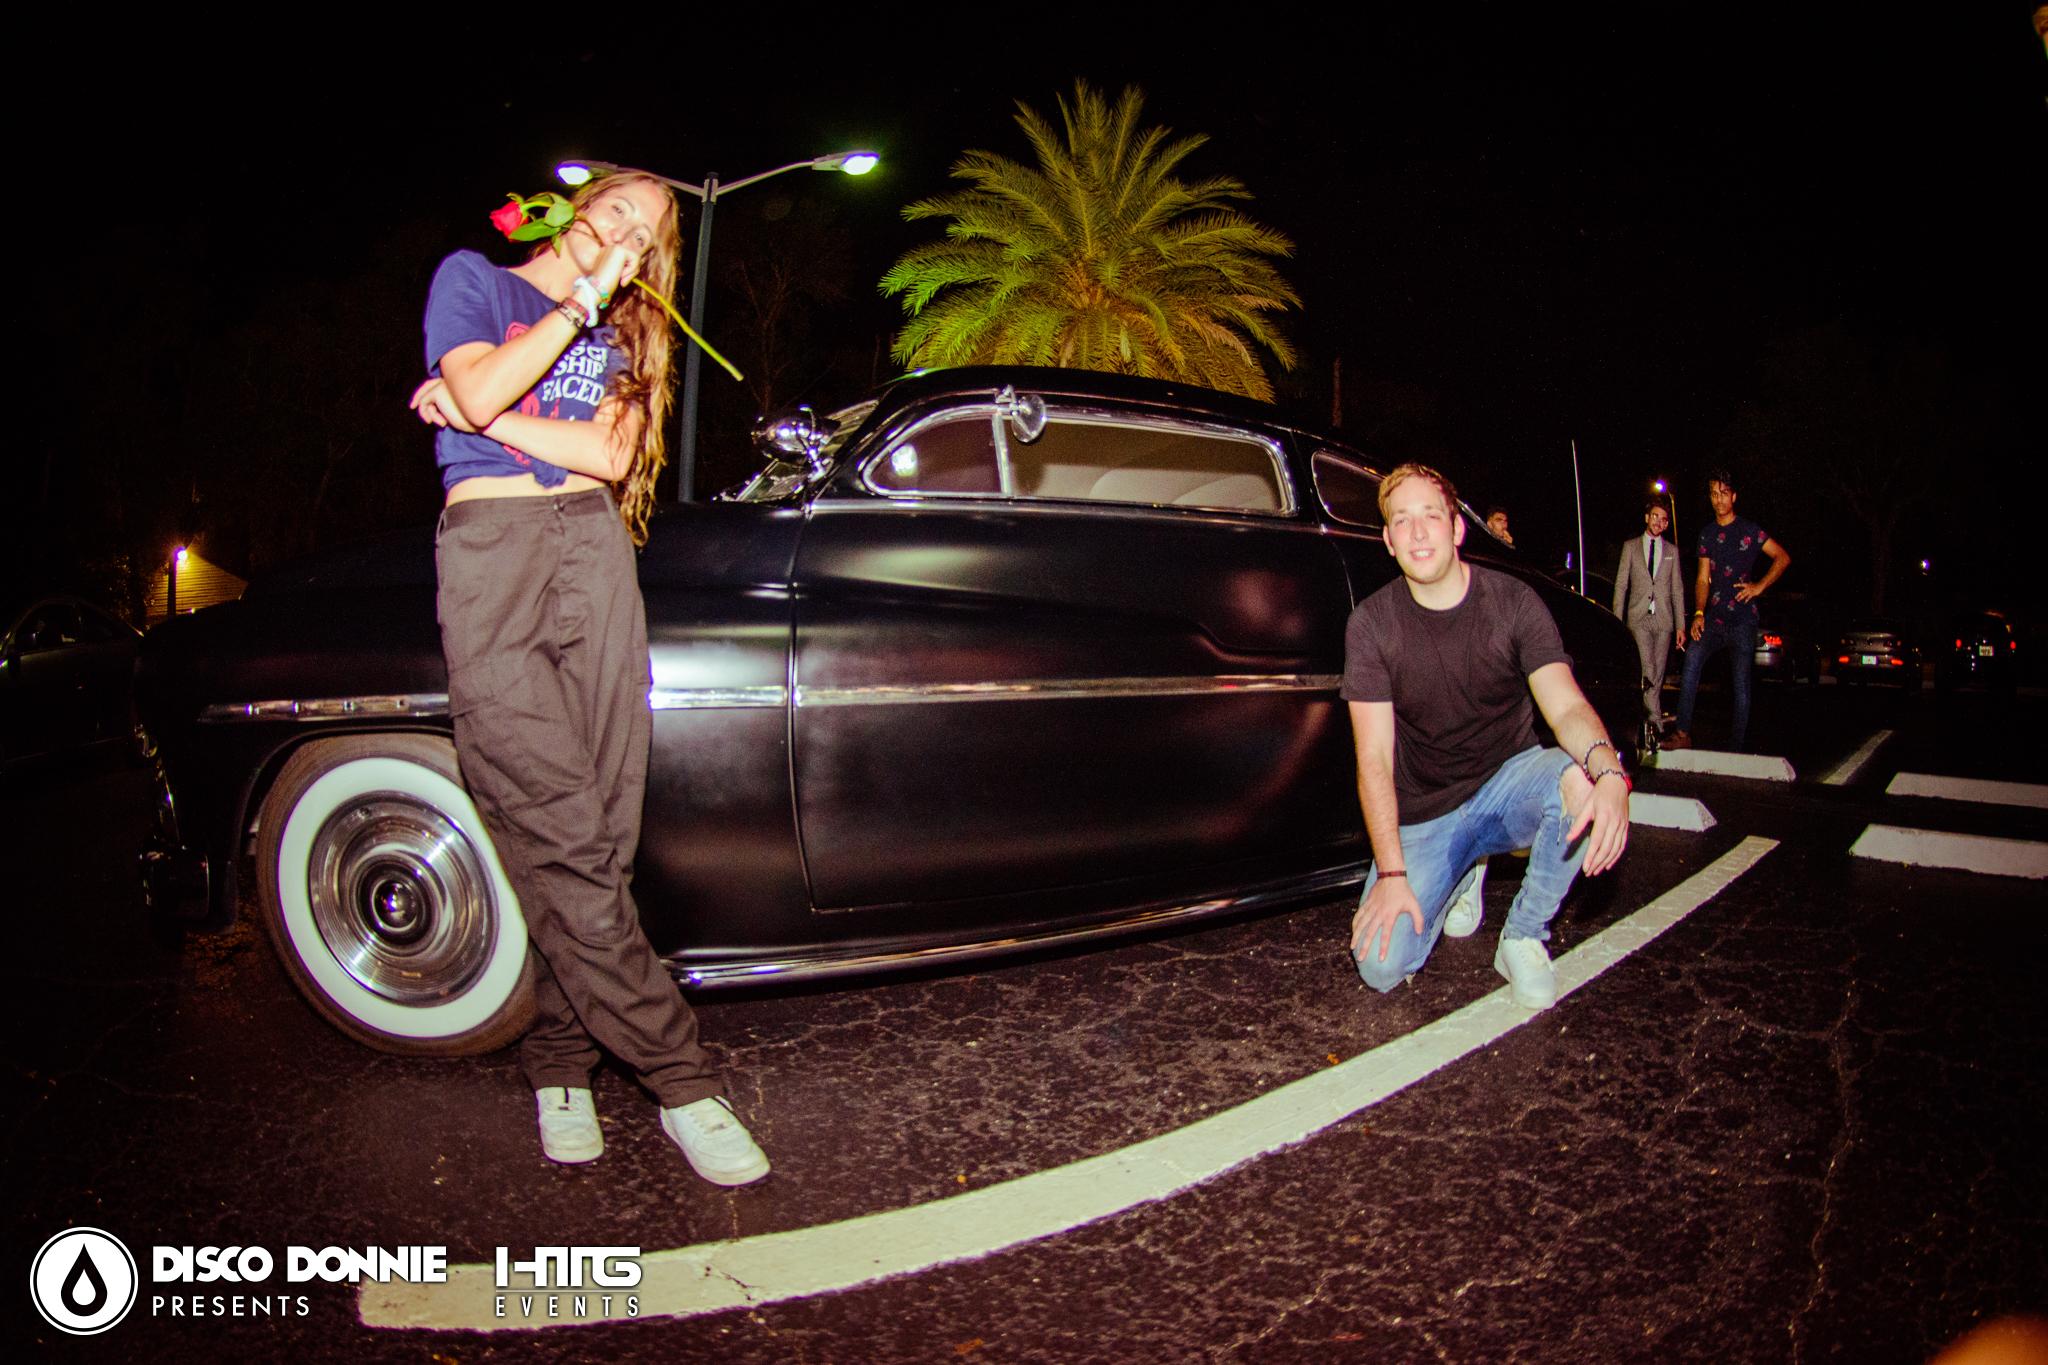 Promoter Htg Events Genre B Artist Bonnie X Clyde